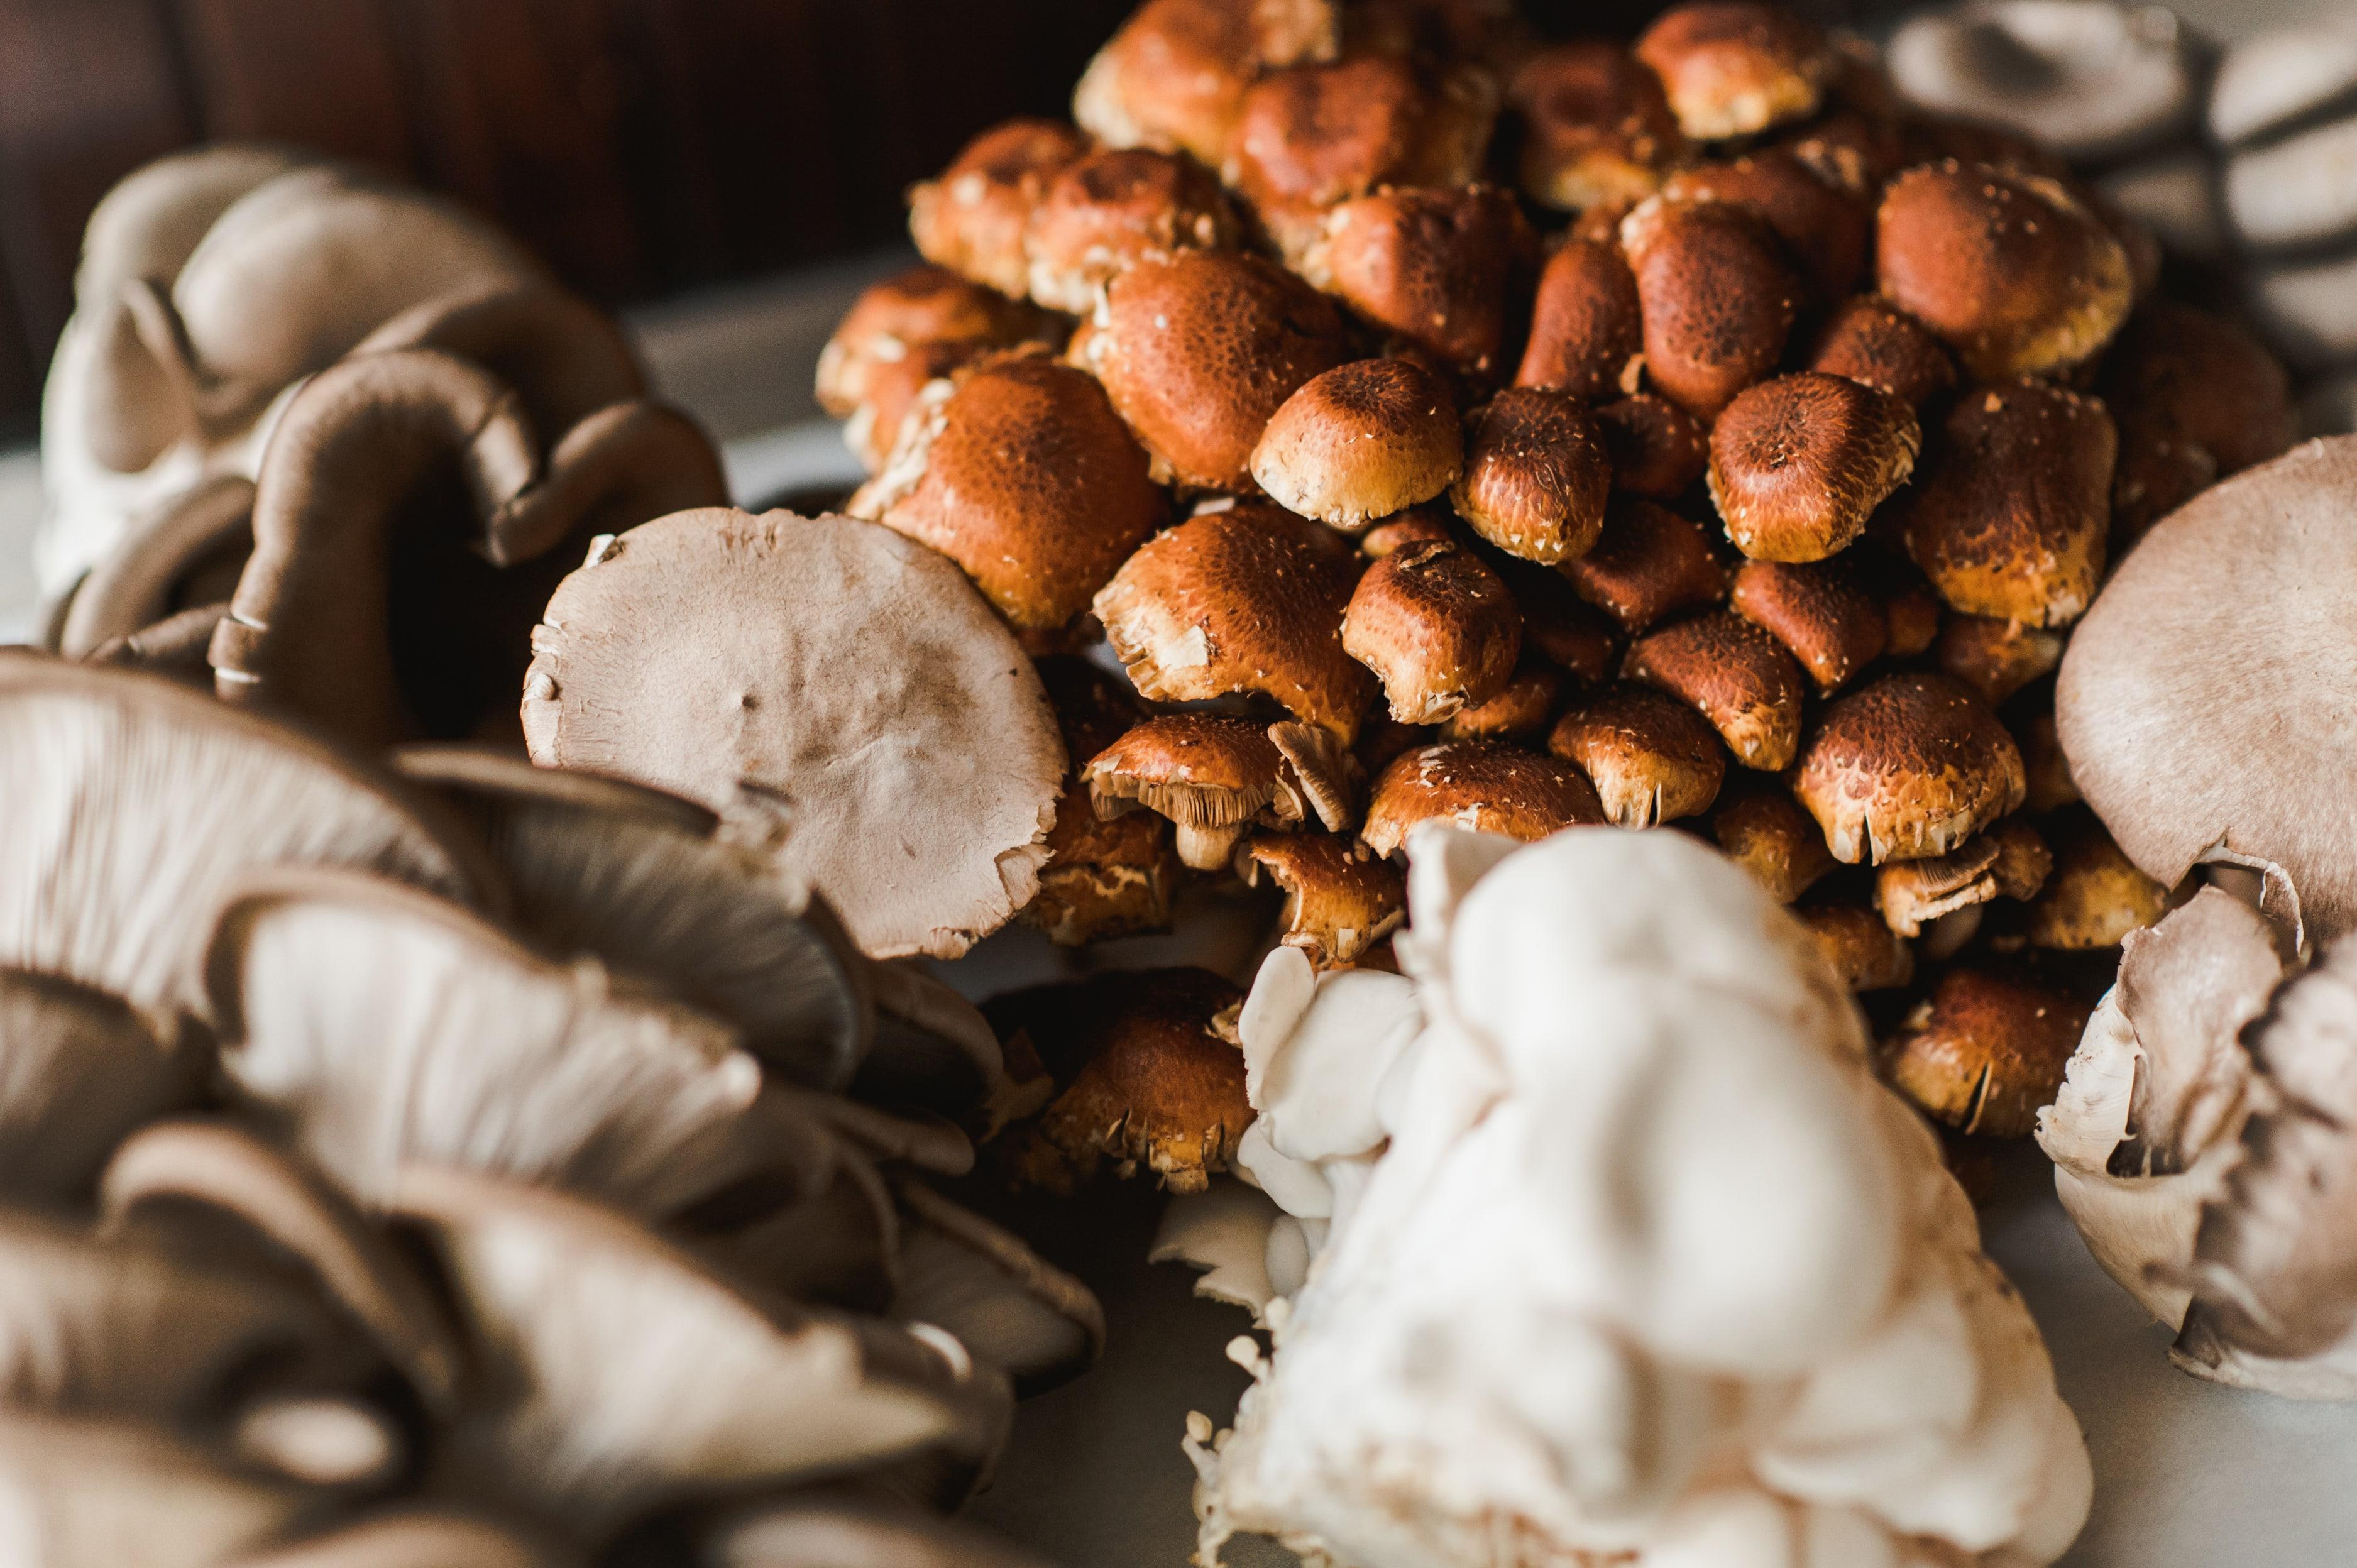 Bounty of mushrooms